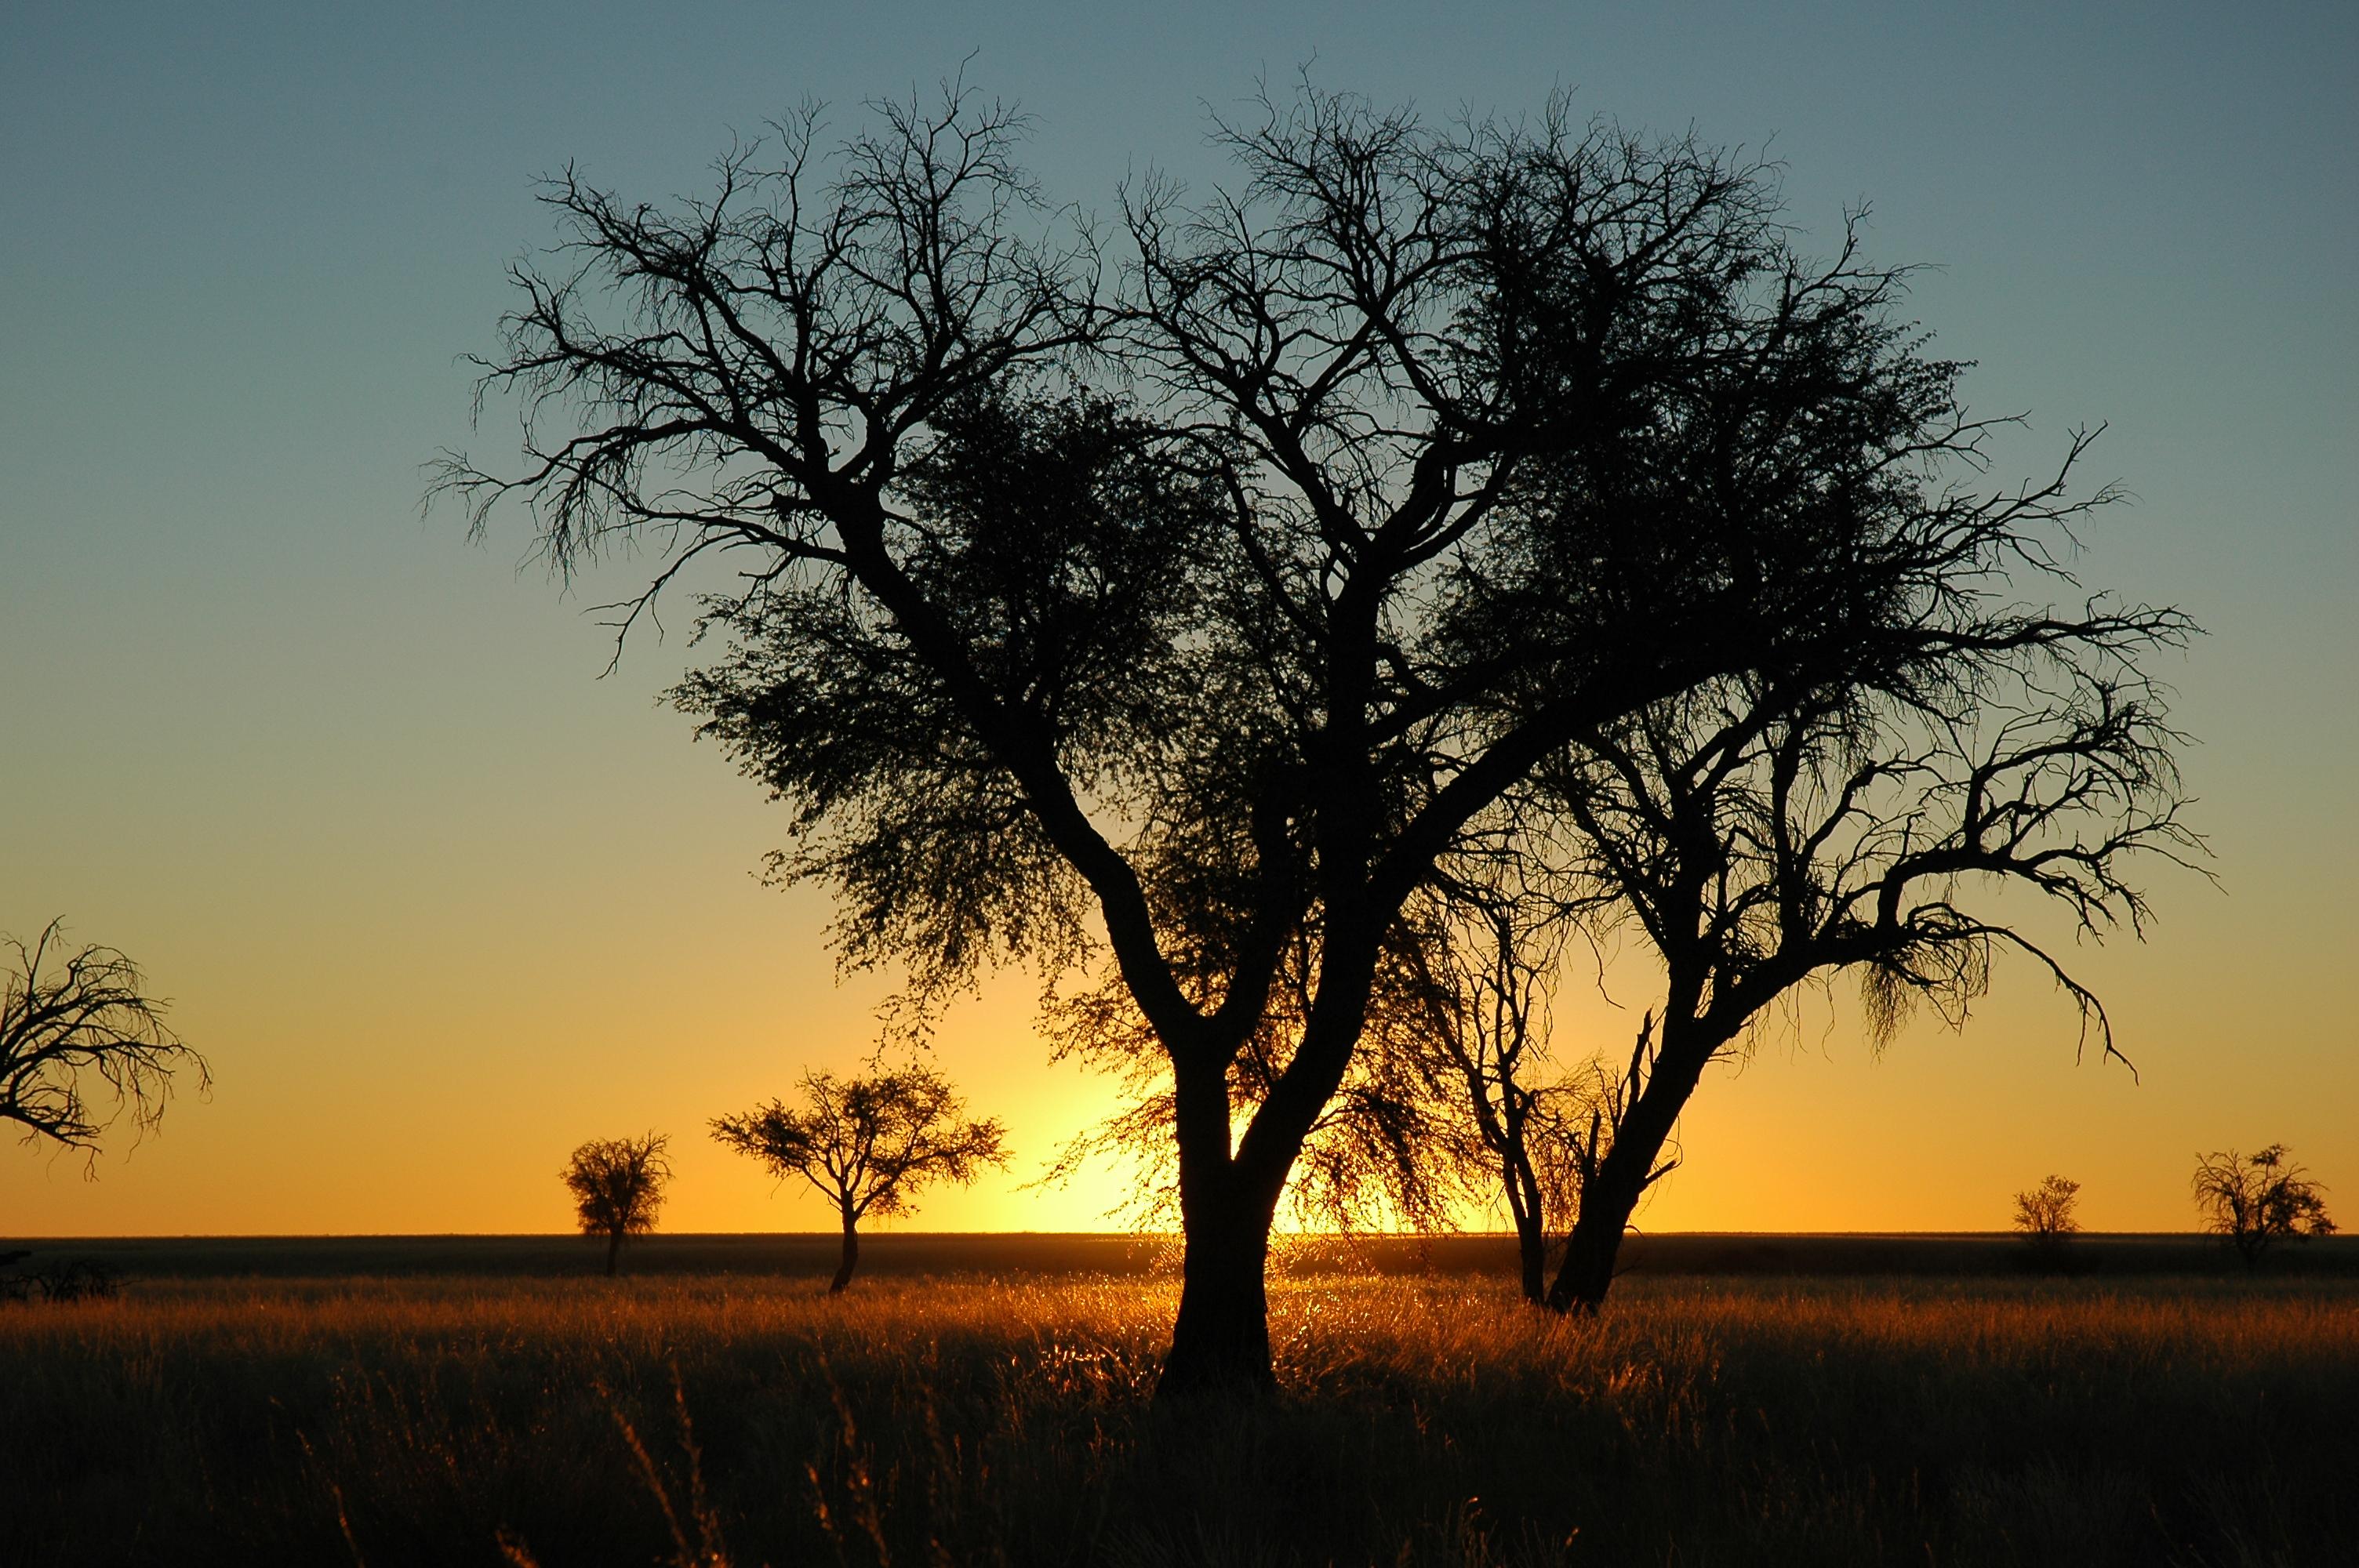 File:Namibie Namib Naukluft Park Sunset 02.JPG - Wikimedia Commons